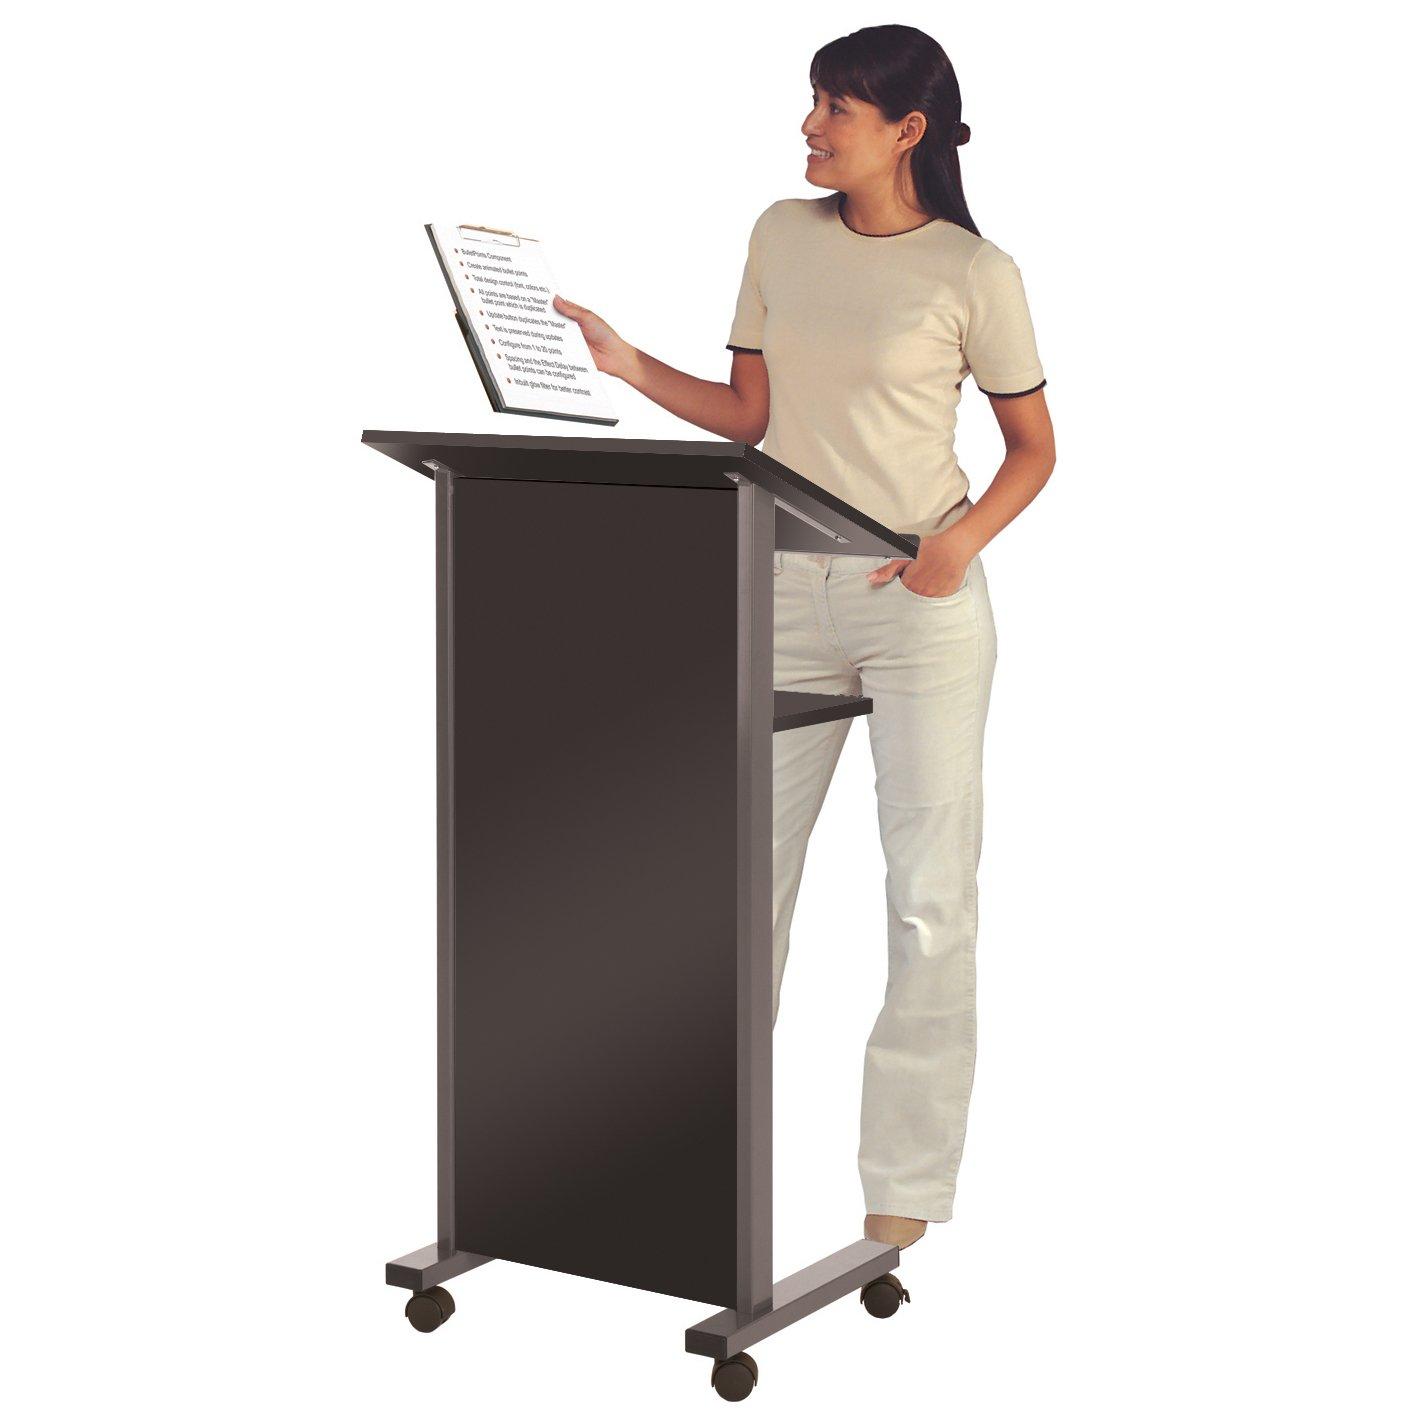 Wonderwall Mobile Lectern Stand in Black - Standing Reading Desk Wonderwall Products Ltd